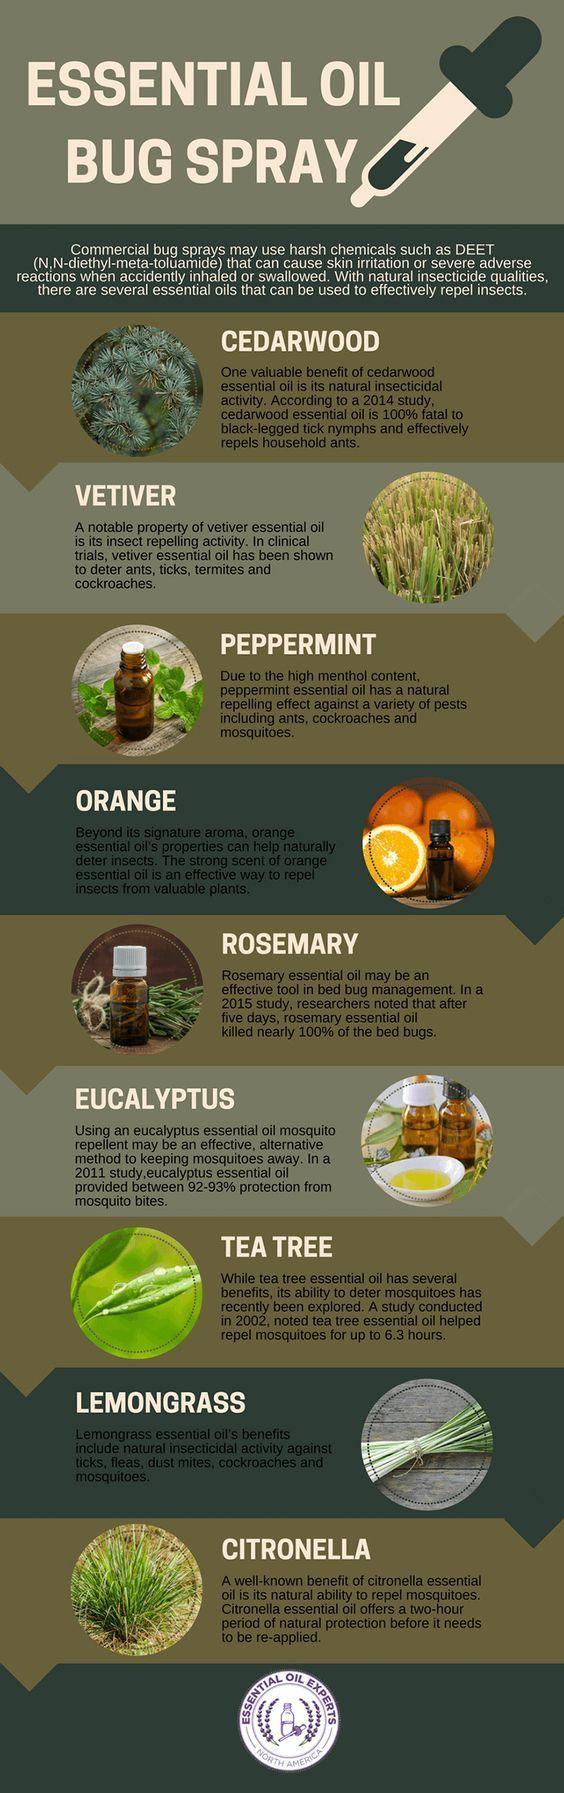 32 best Essential Oils images on Pinterest   Essential oils ...